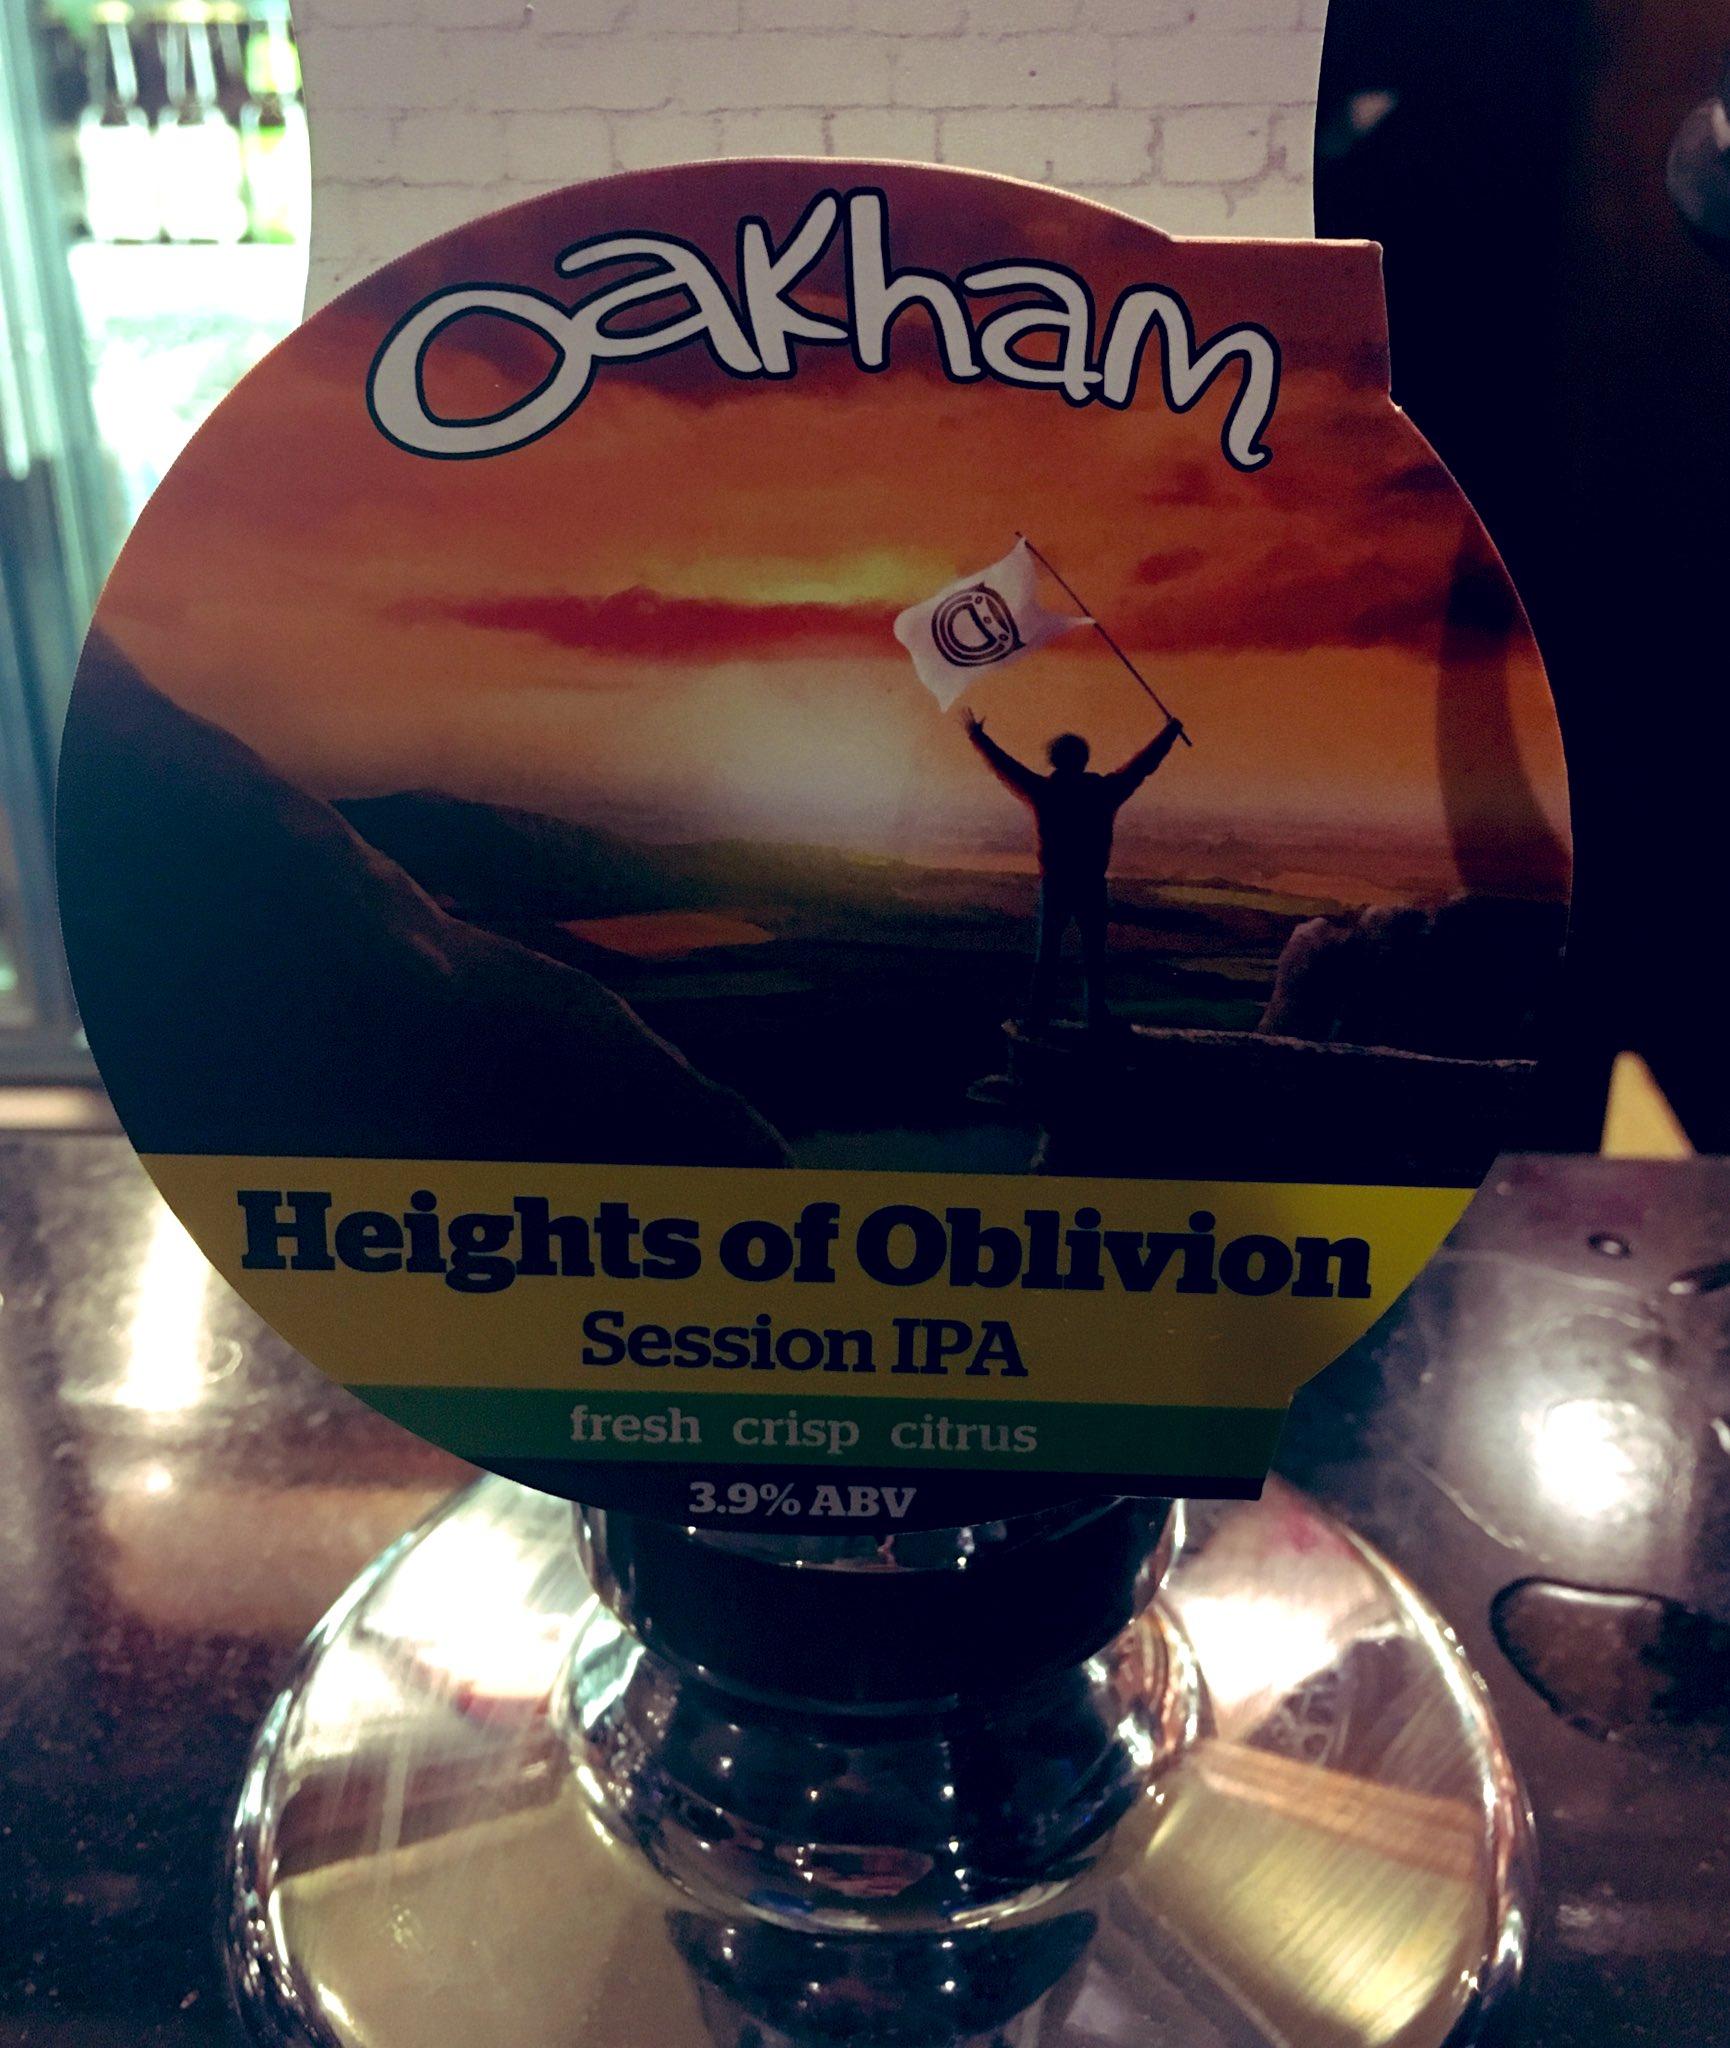 112: Heights of Oblivion